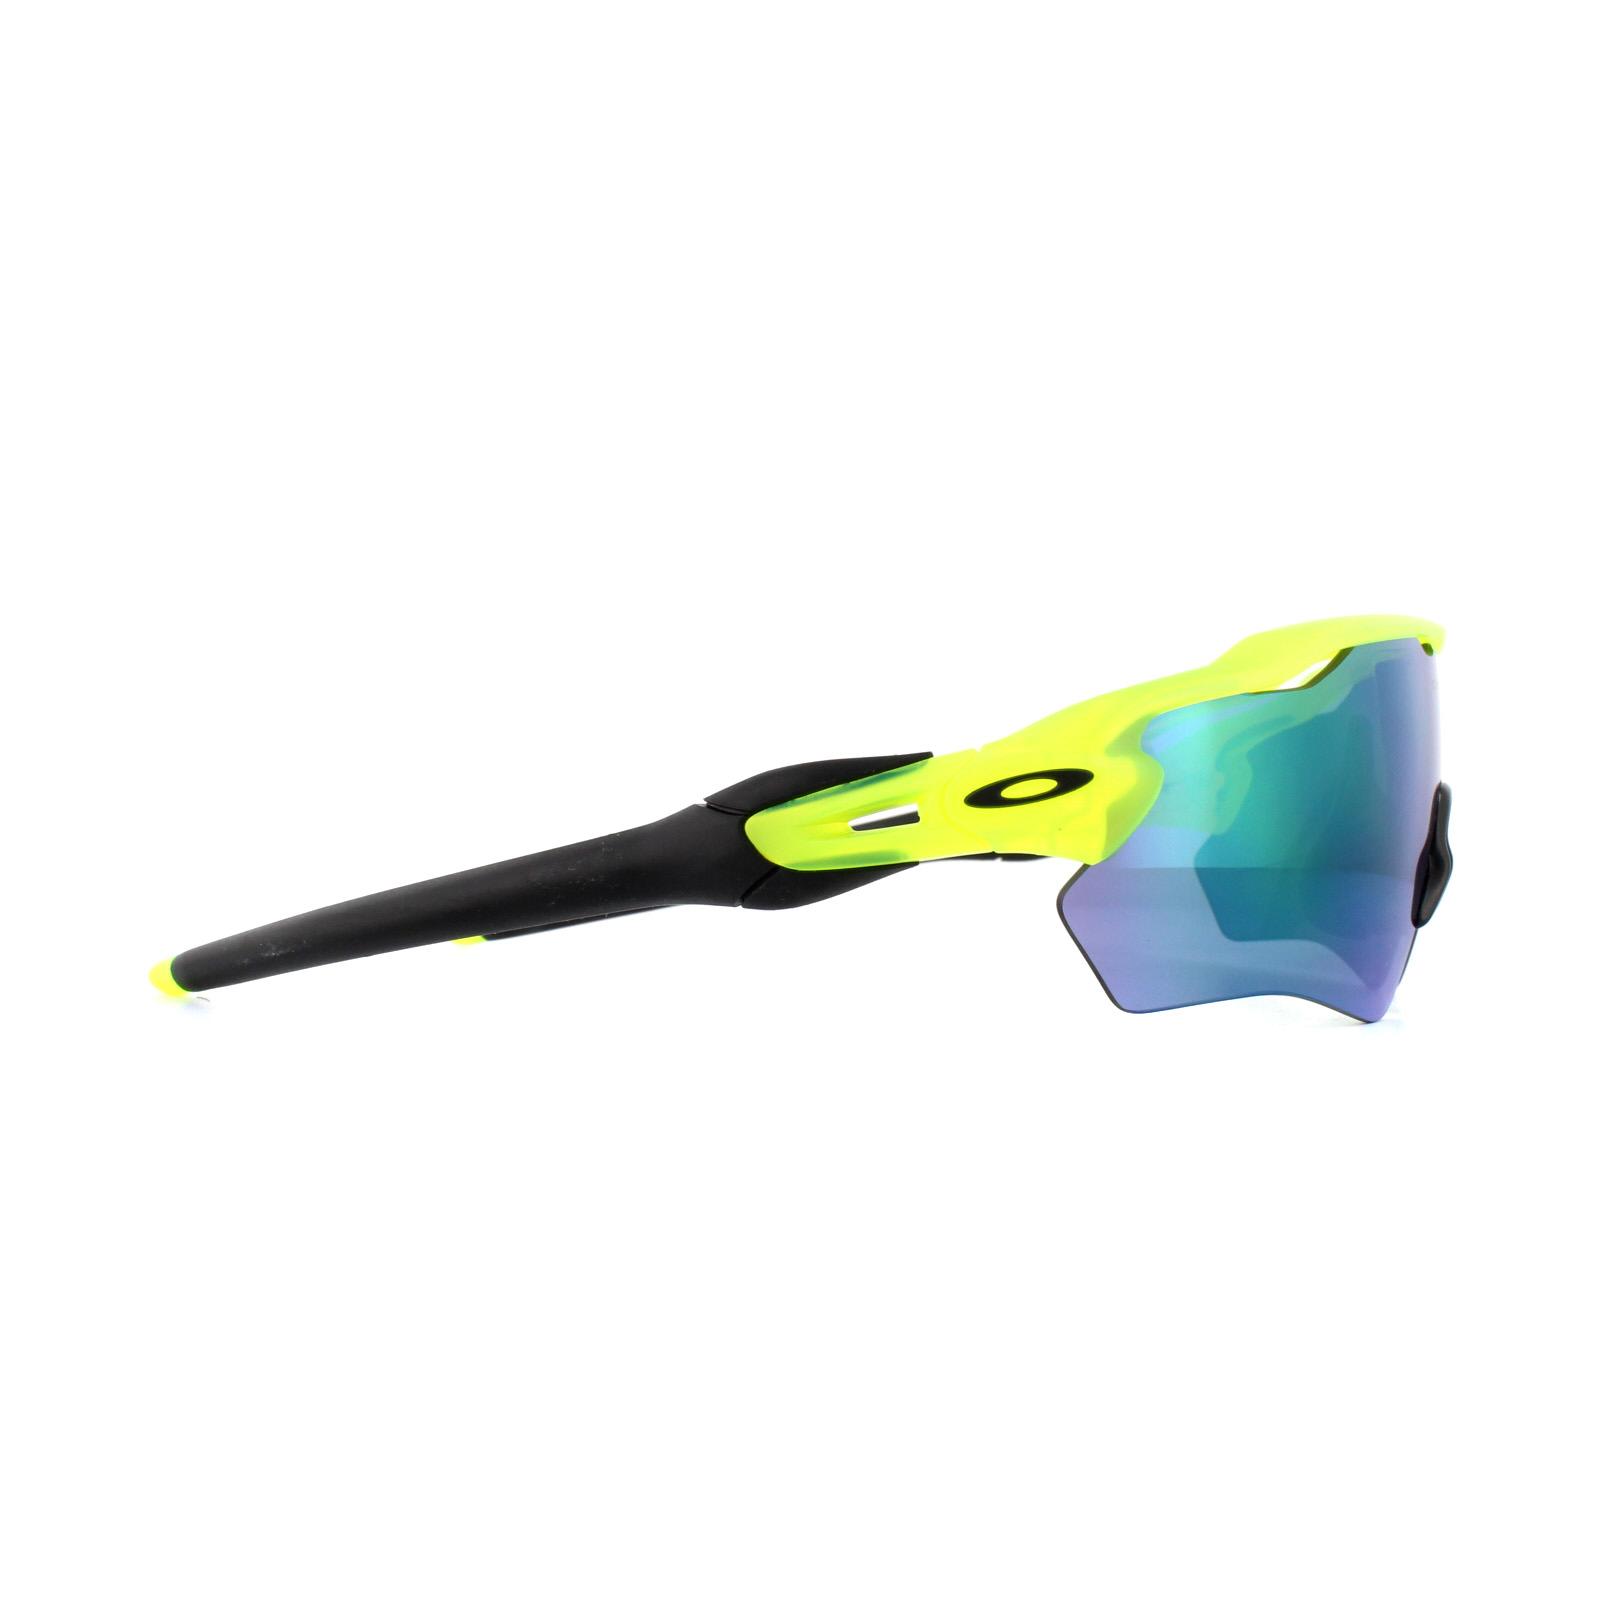 6c9c1c3c41 Sentinel Oakley Sunglasses Radar EV XS Path Youth Fit OJ9001-02 Matte  Uranium Jade Iridiu